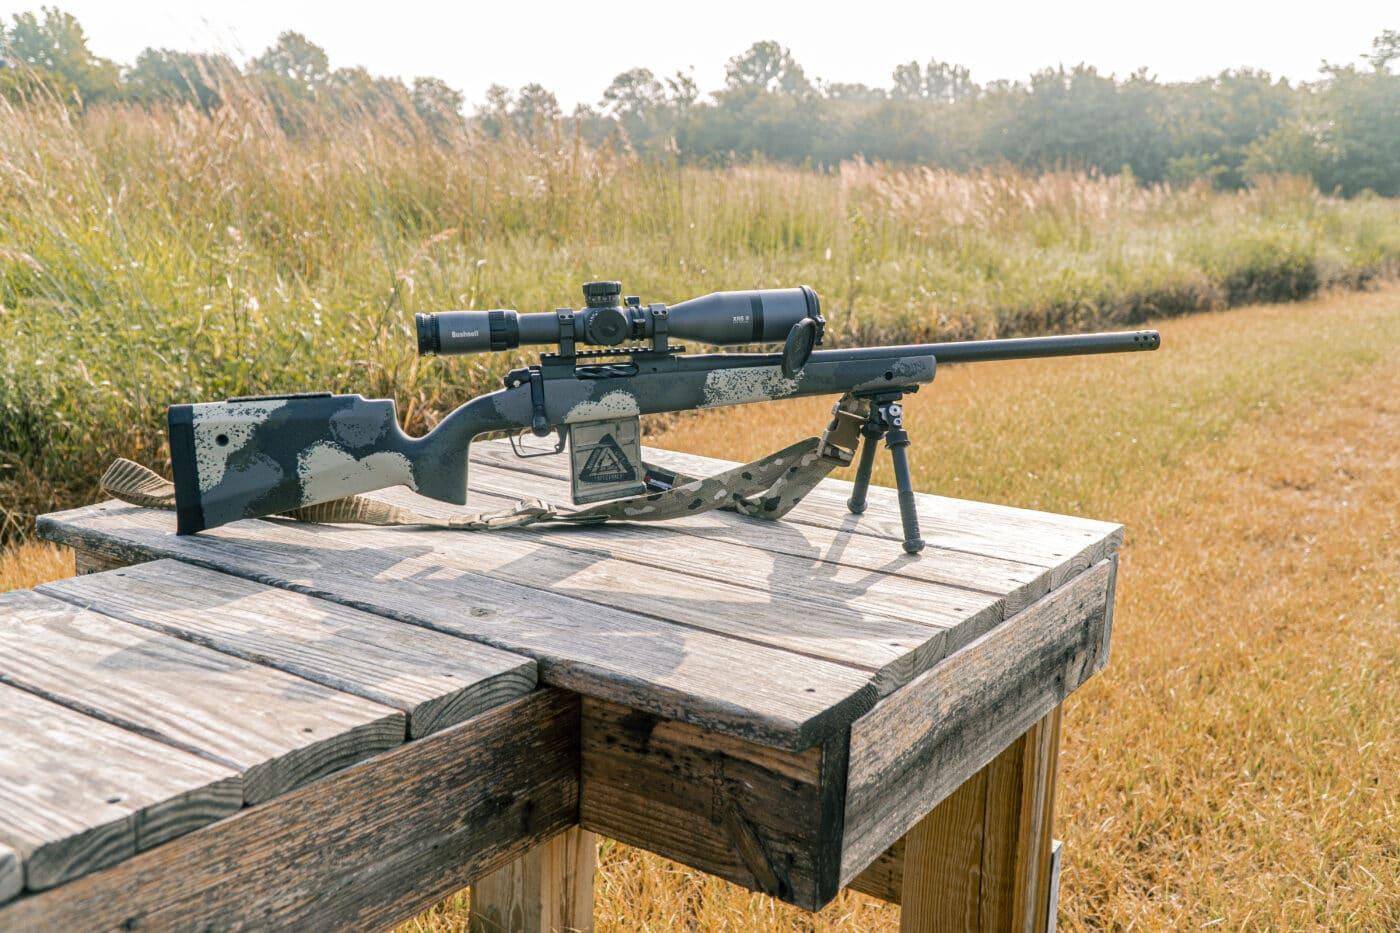 Springfield Waypoint .308 rifle for long range